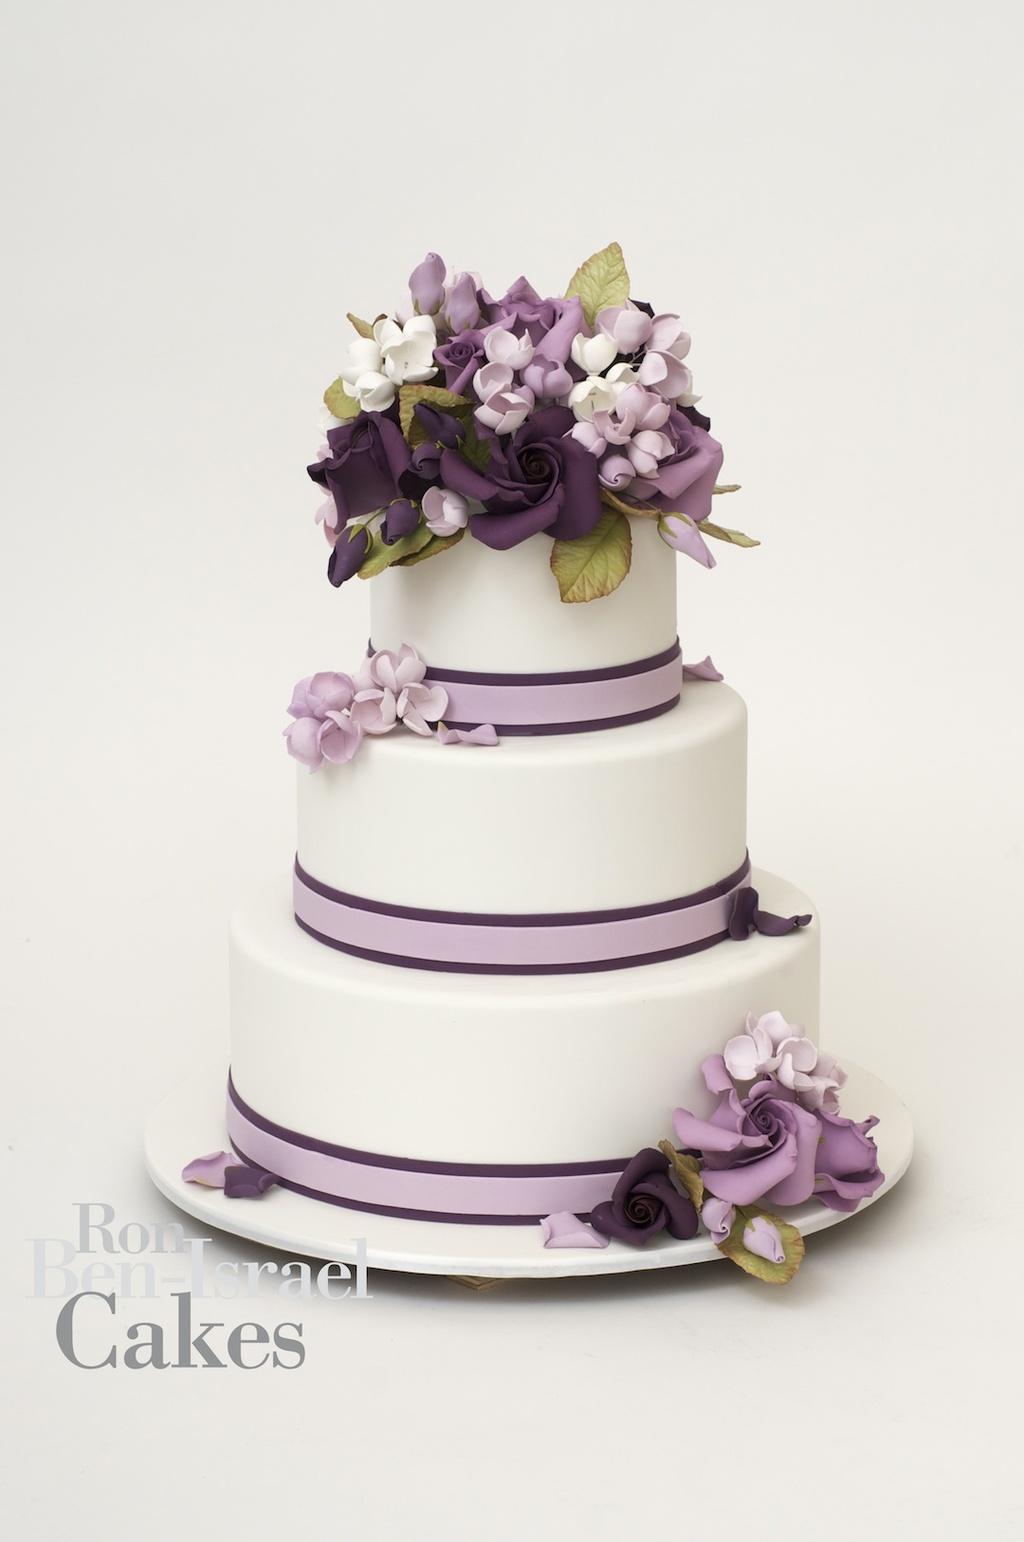 Wedding-cake-inspiration-ron-ben-isreal-wedding-cakes-lilac-grape-purple.original.full